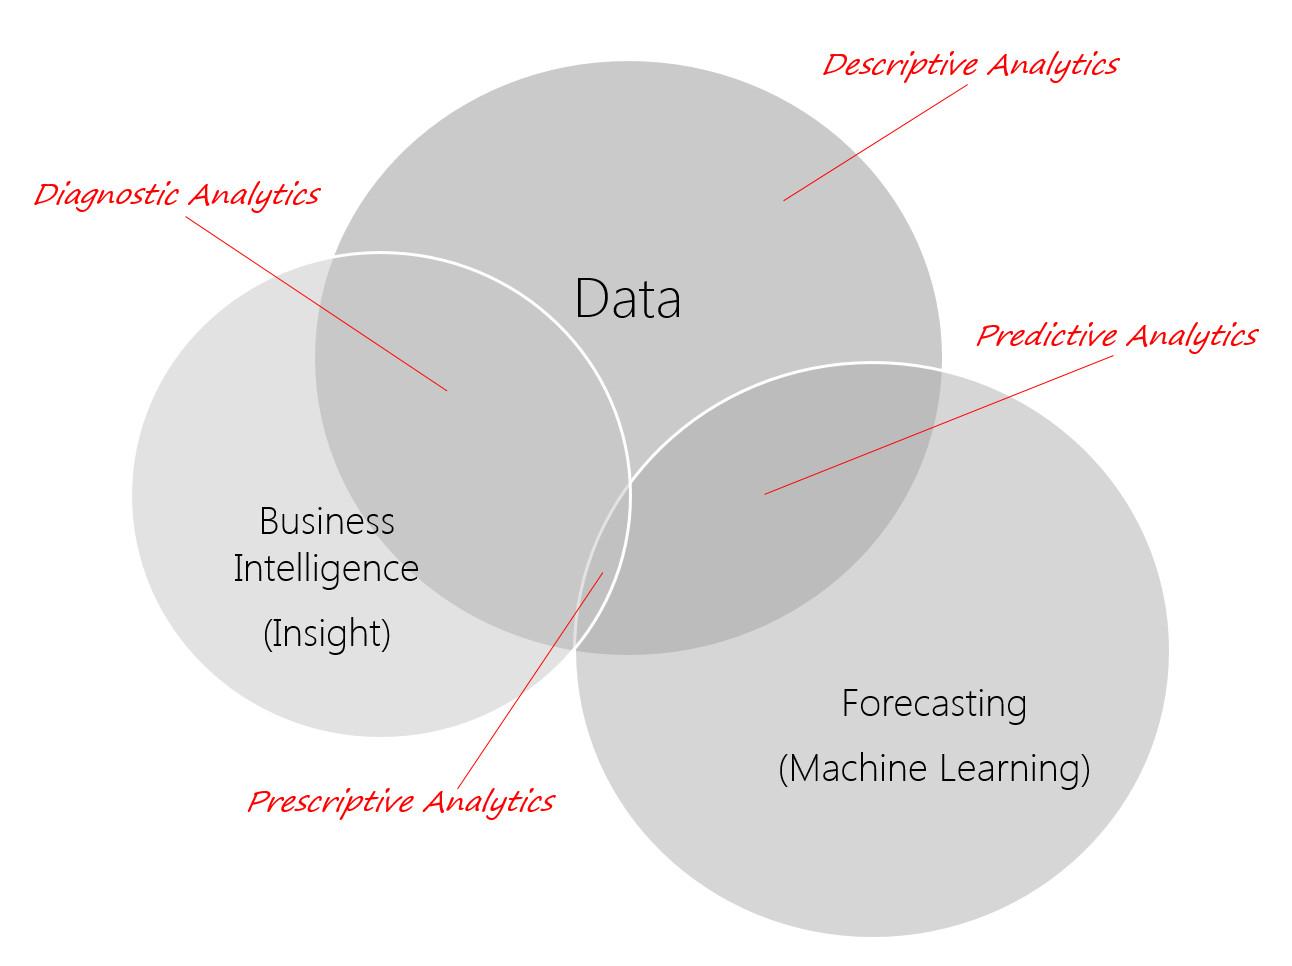 Venn Diagram where Data, Machine Learning (Forecasting), Business Intelligence (Insights) intersect yo show various analytics